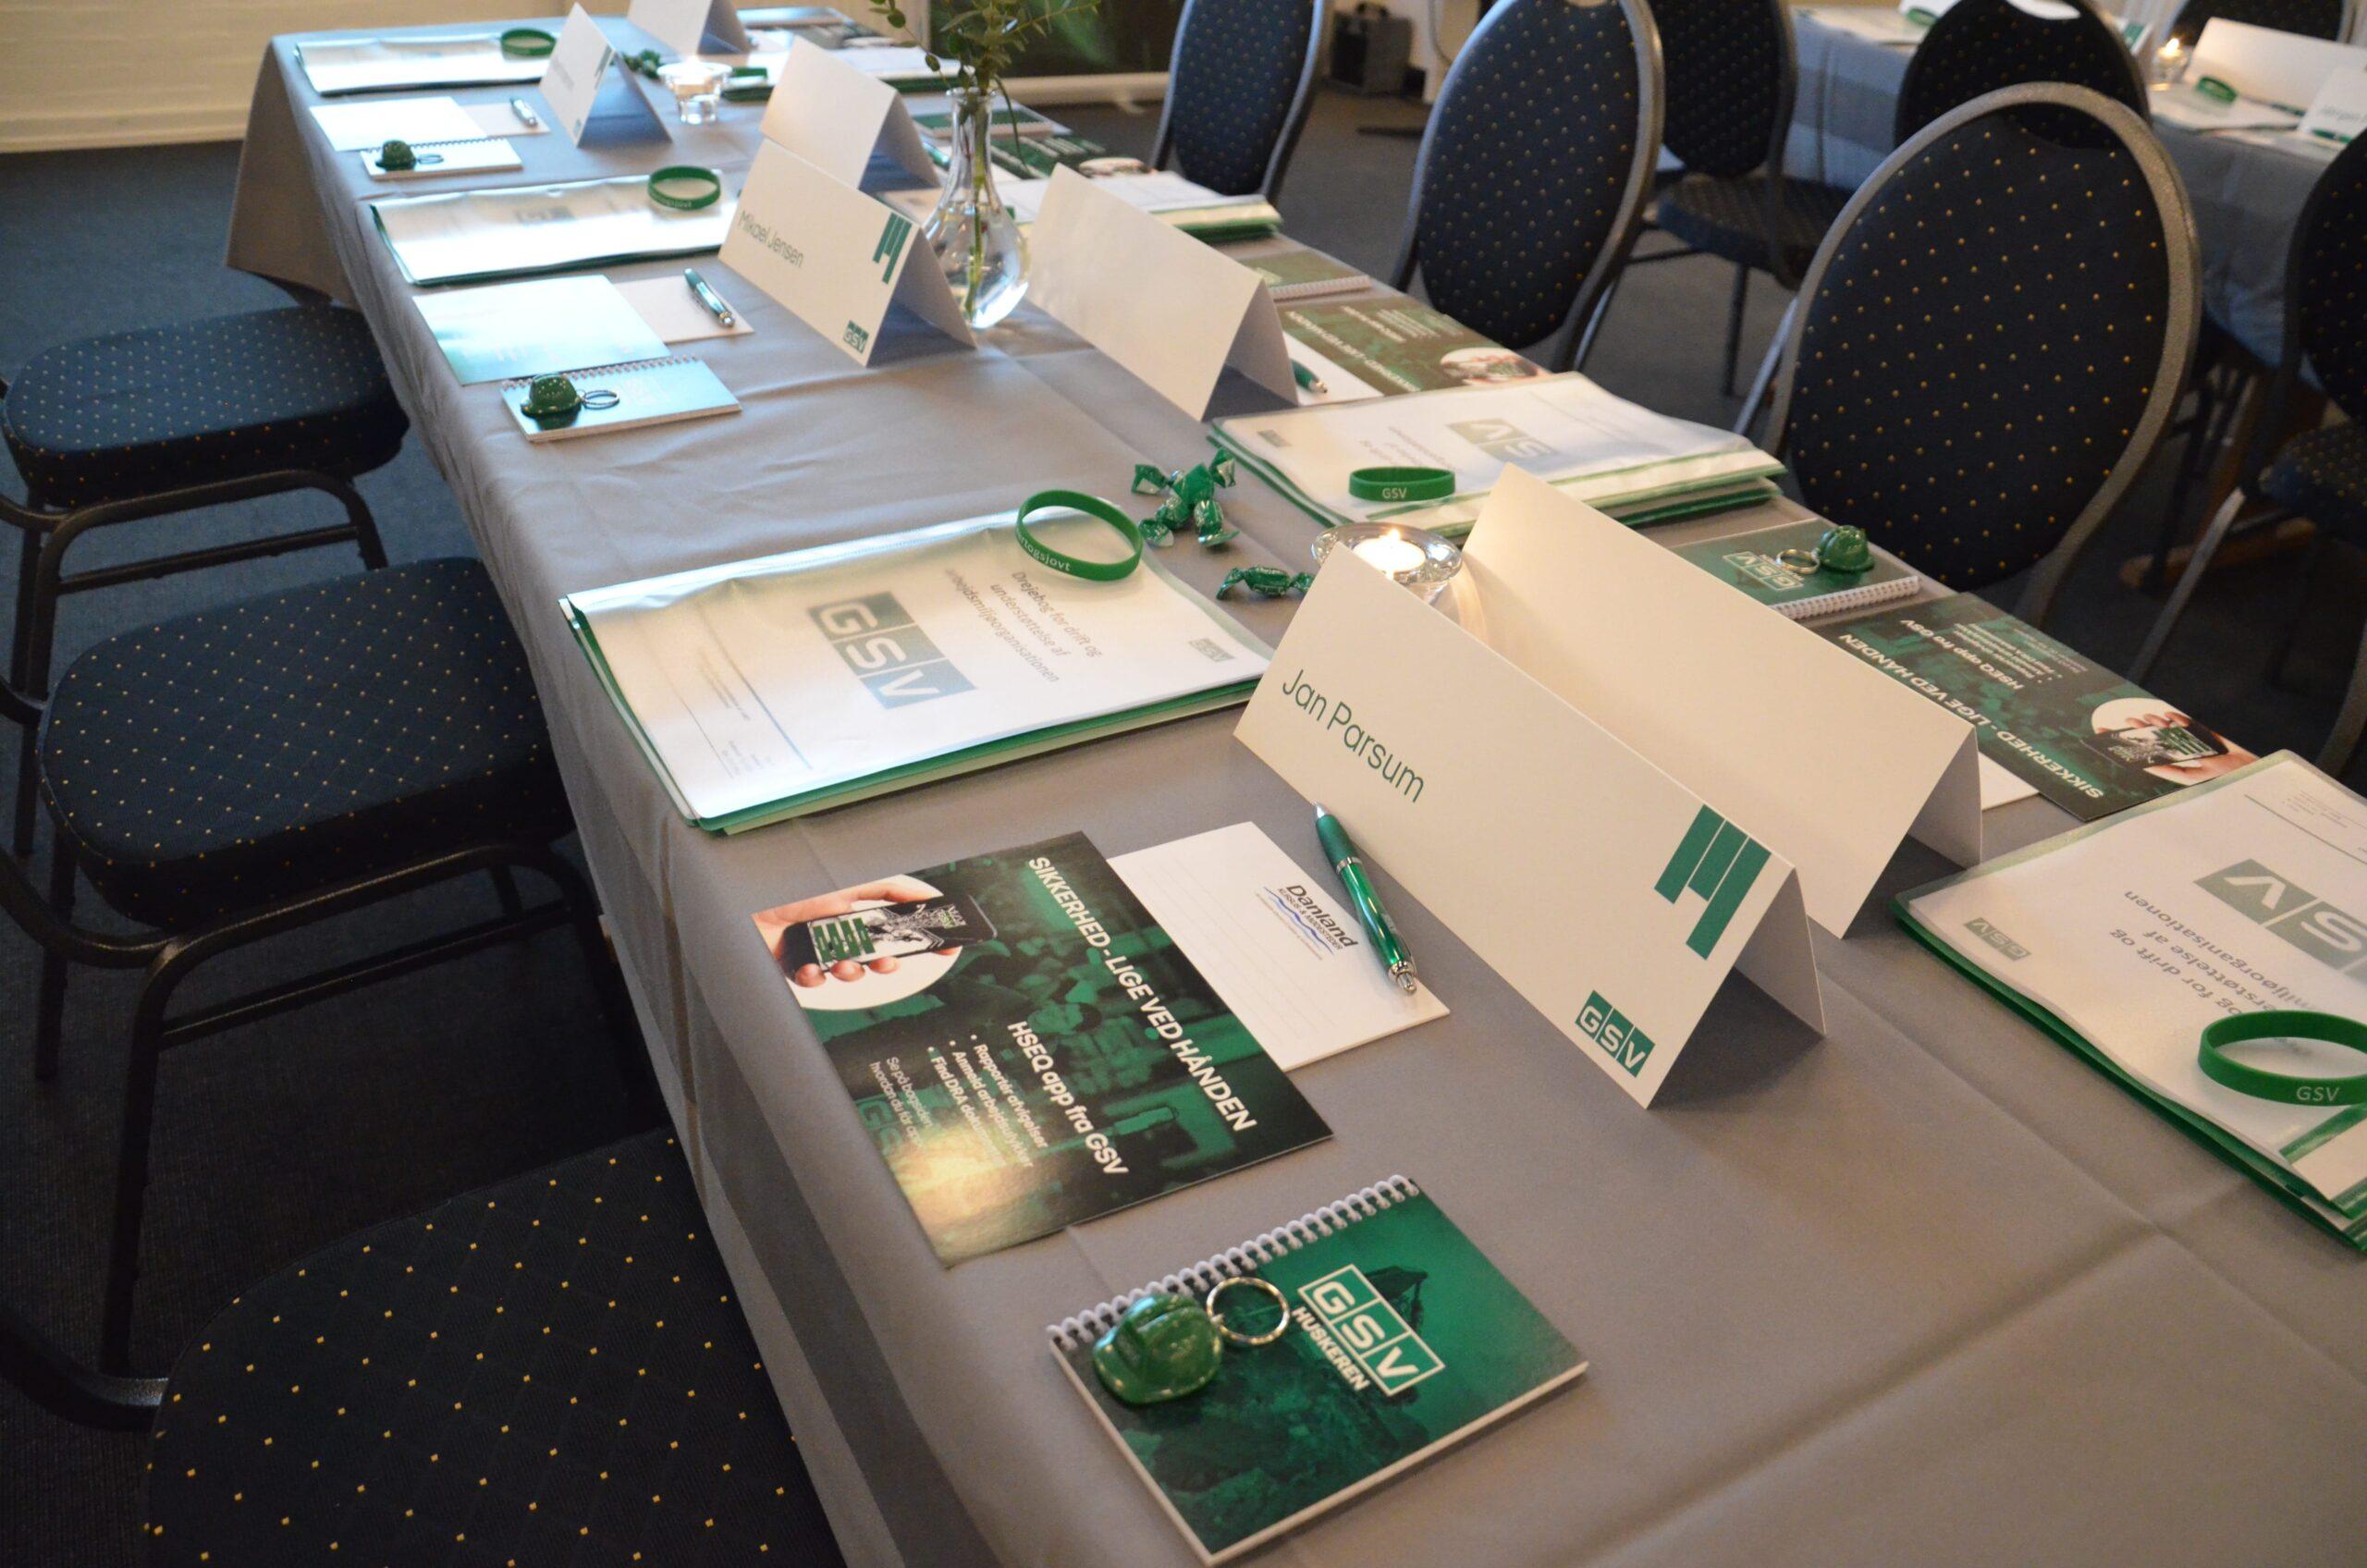 Konference, kursus eller møde i Faaborg på Restaurant Klinten.